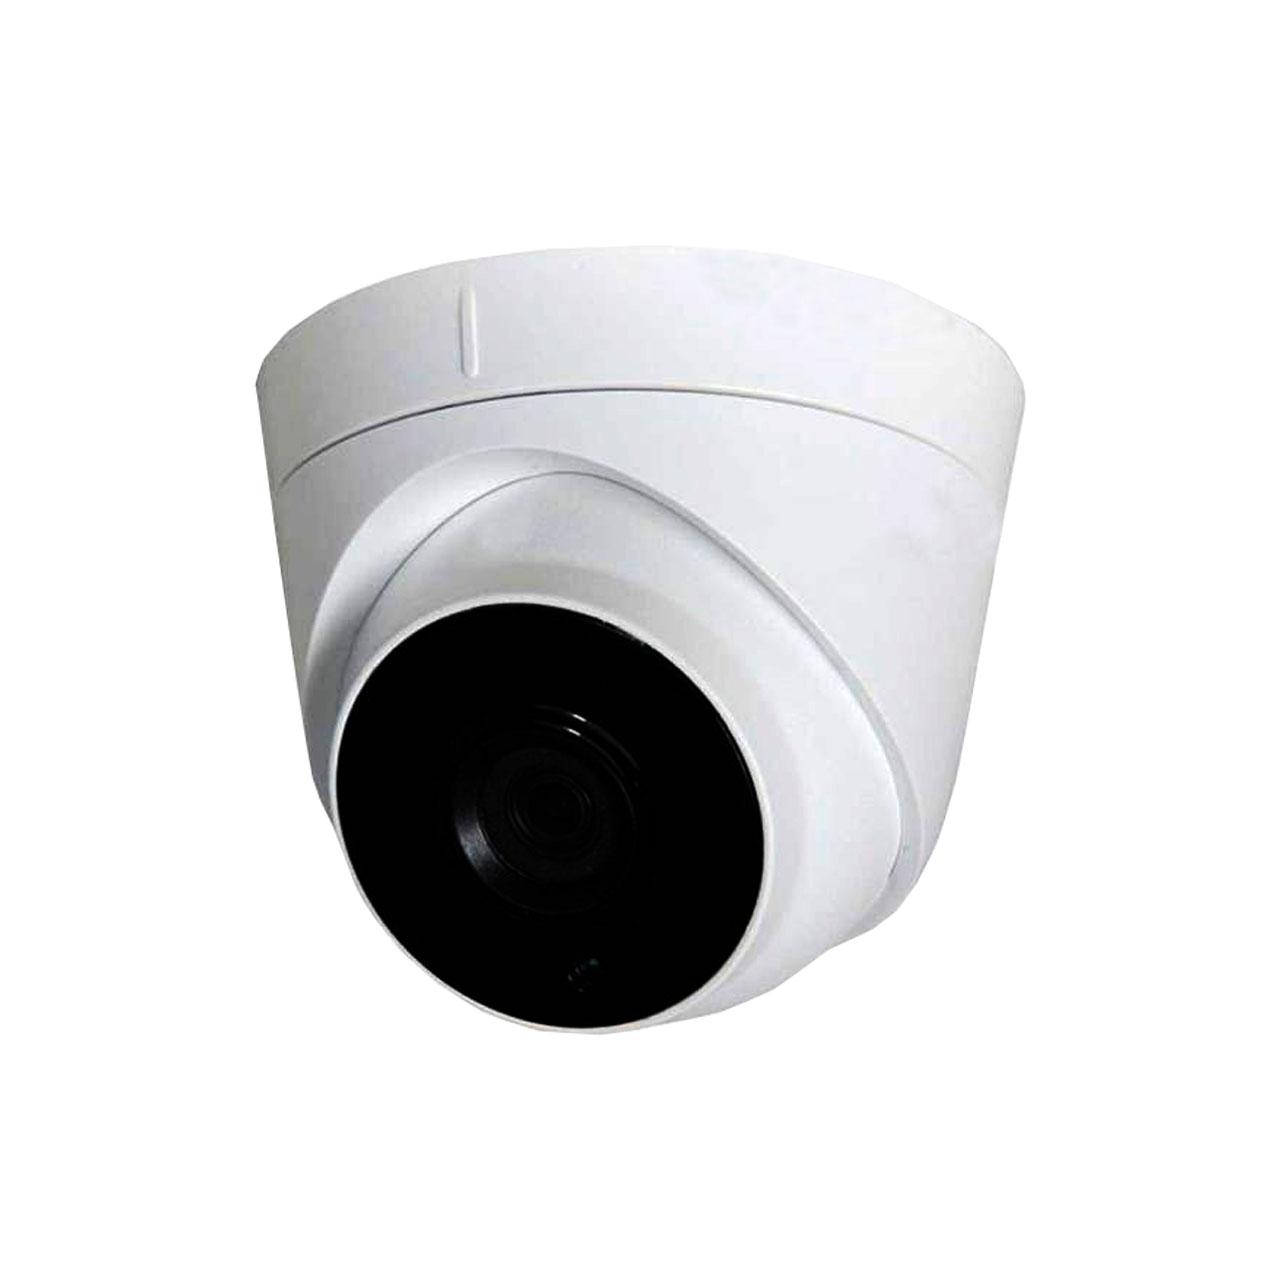 دوربین مداربسته آنالوگ مدل SHA1